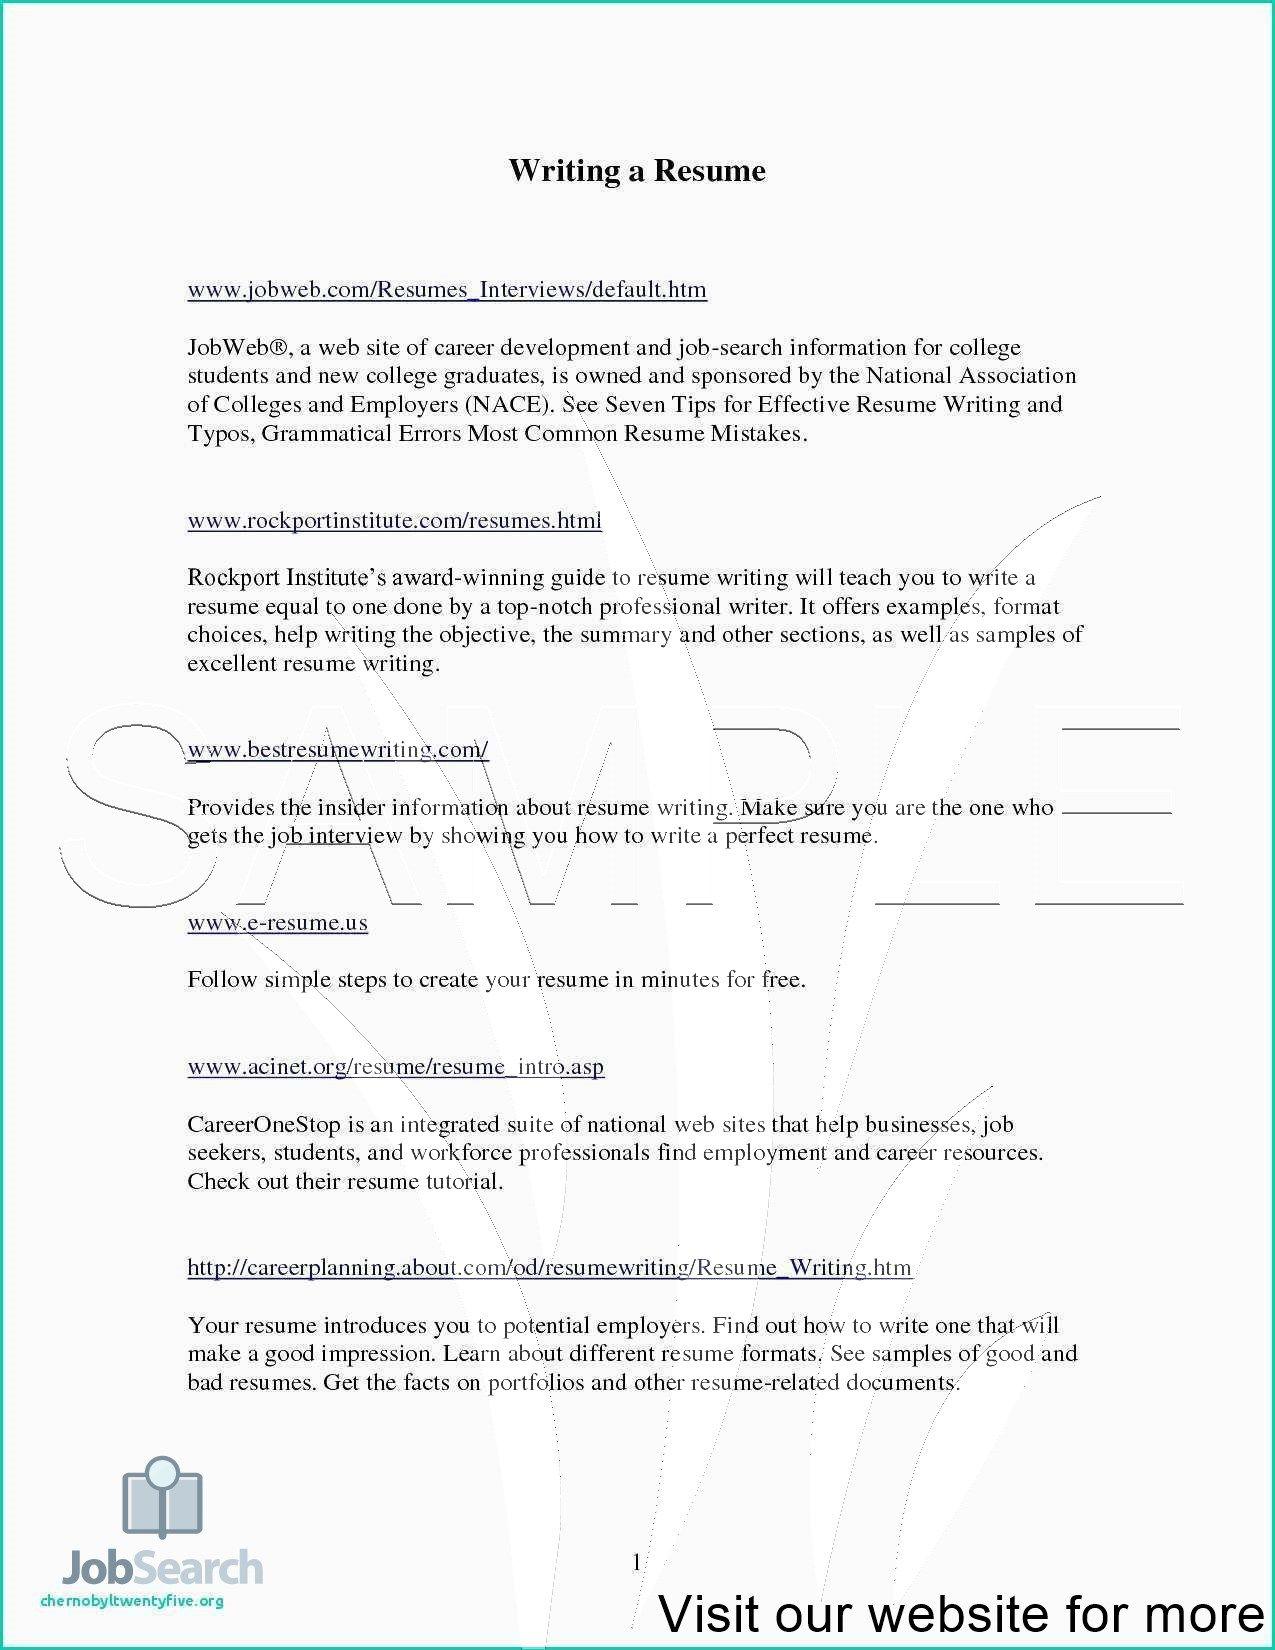 Resume Template Free Customer Service In 2020 Professional Resume Writers Resume Template Professional Resume Writer